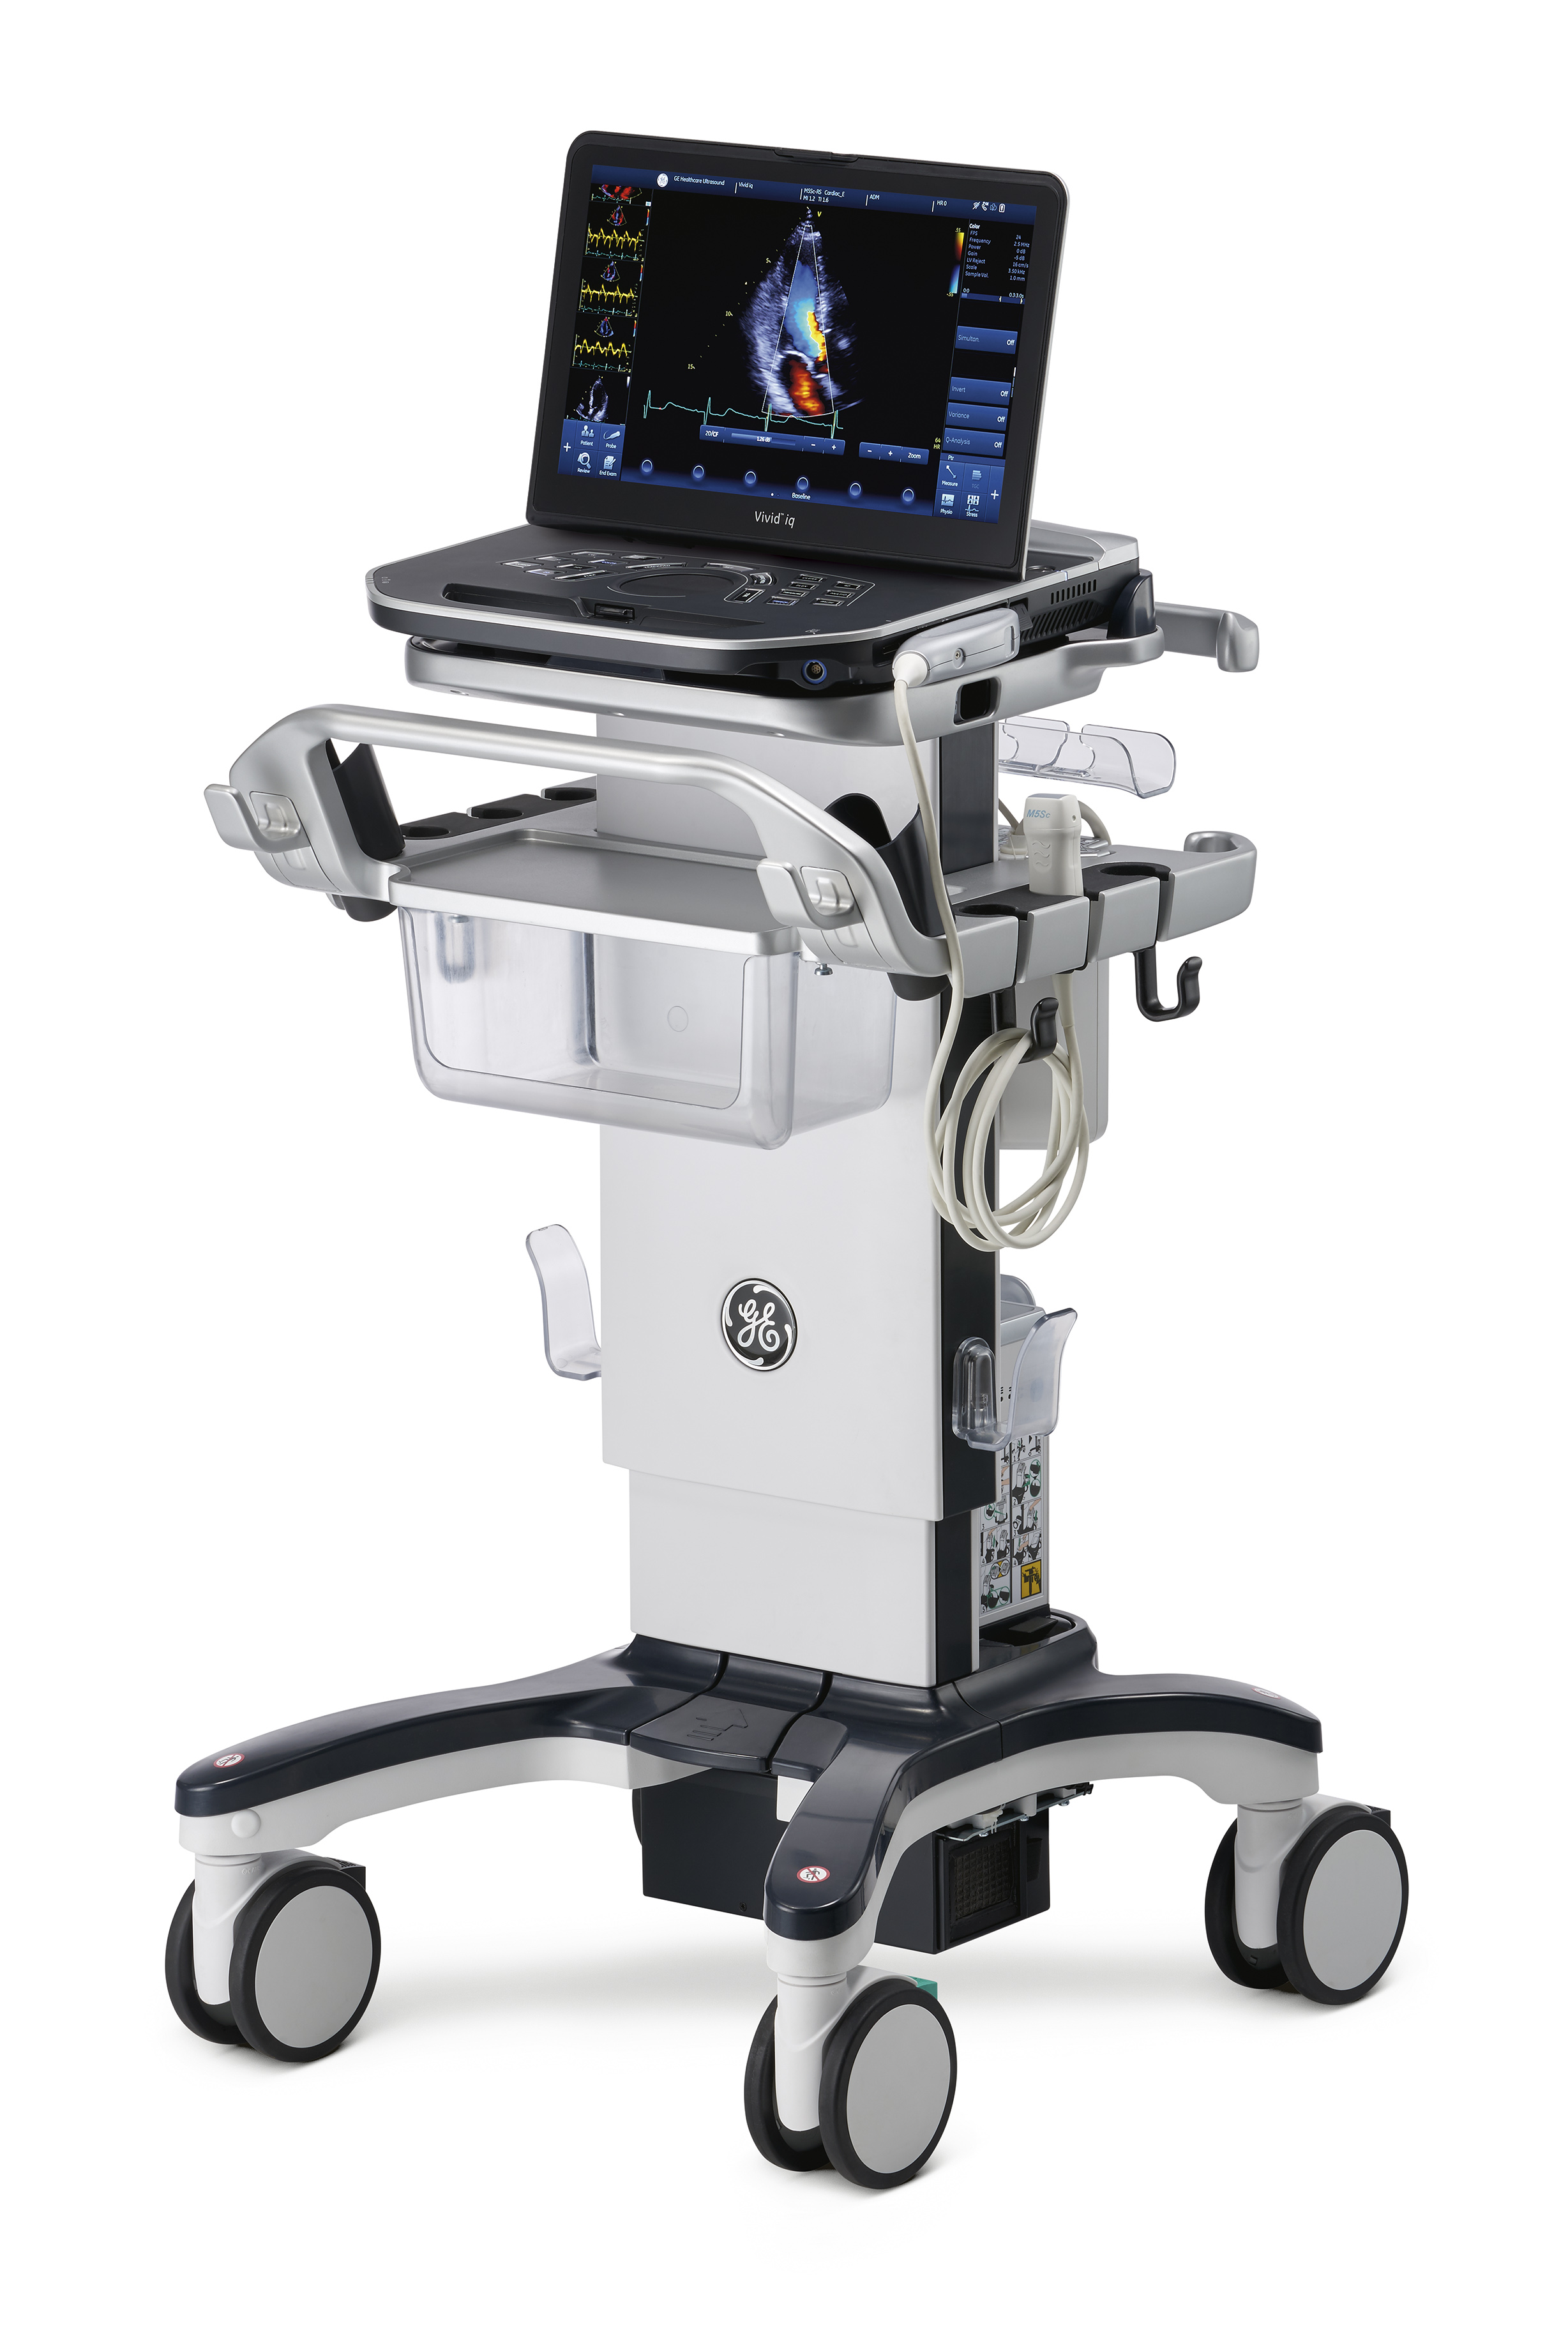 philips ultrasound machine user manual